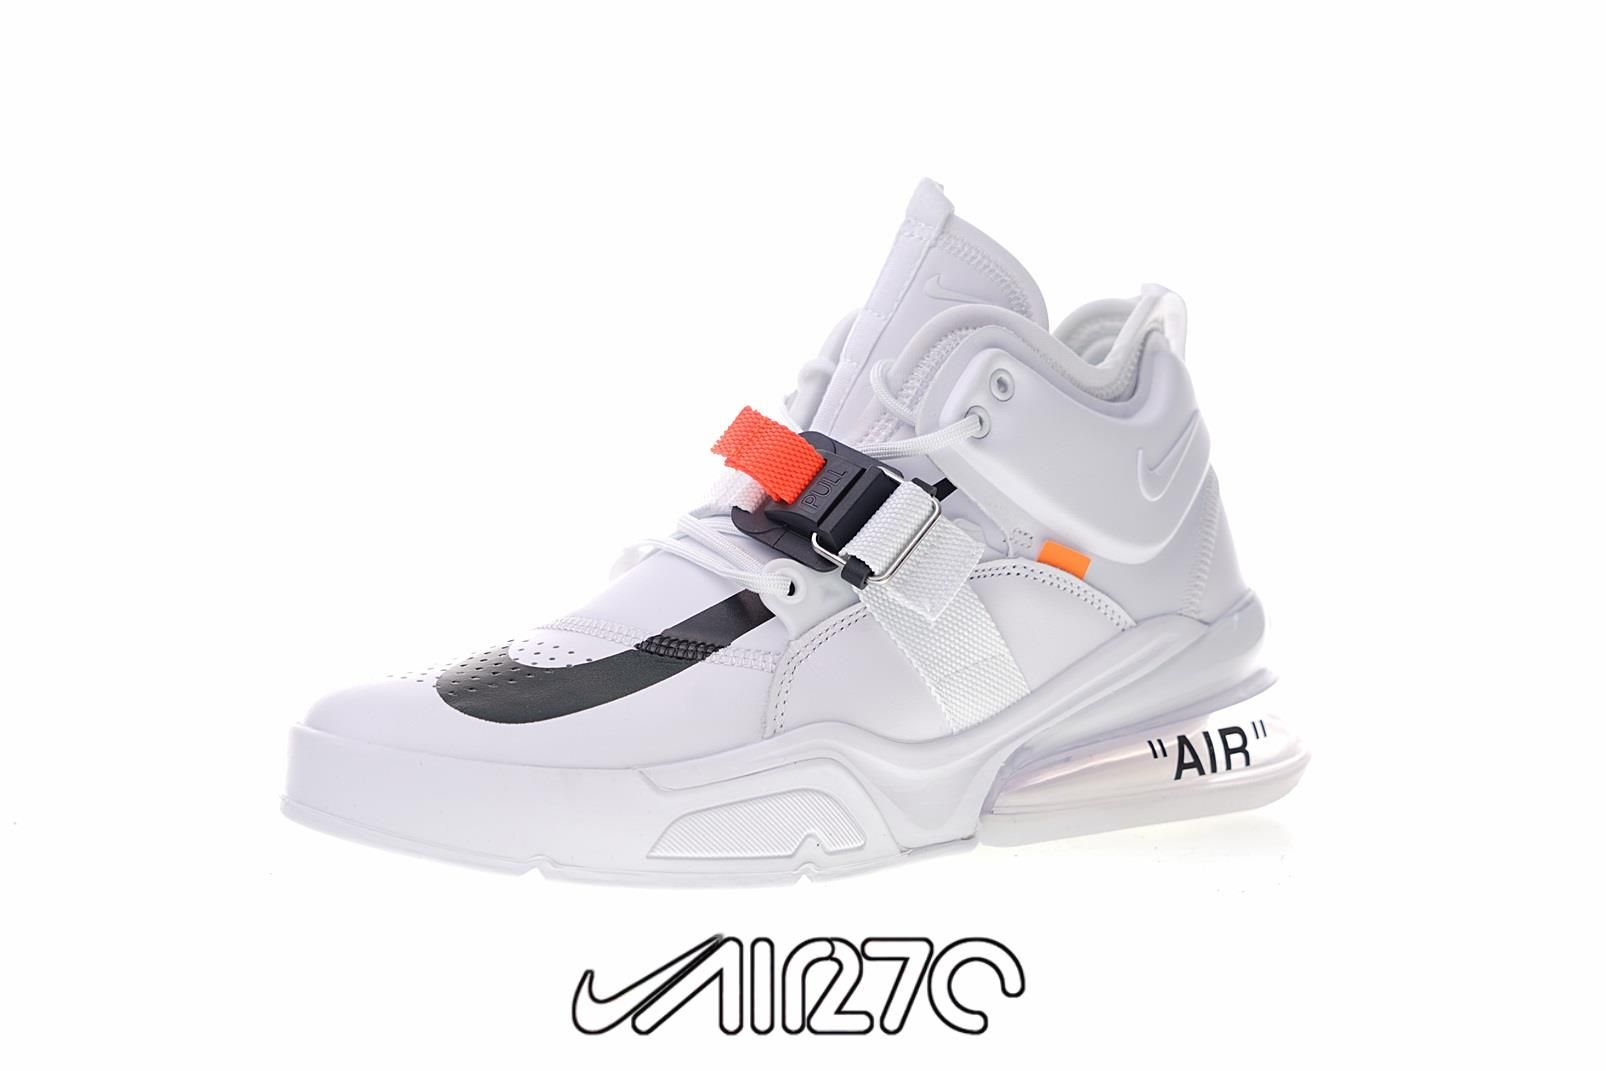 Custom Nike Air Force 270 x Off-White- White Orange-Black White ... d8c9f3d41f